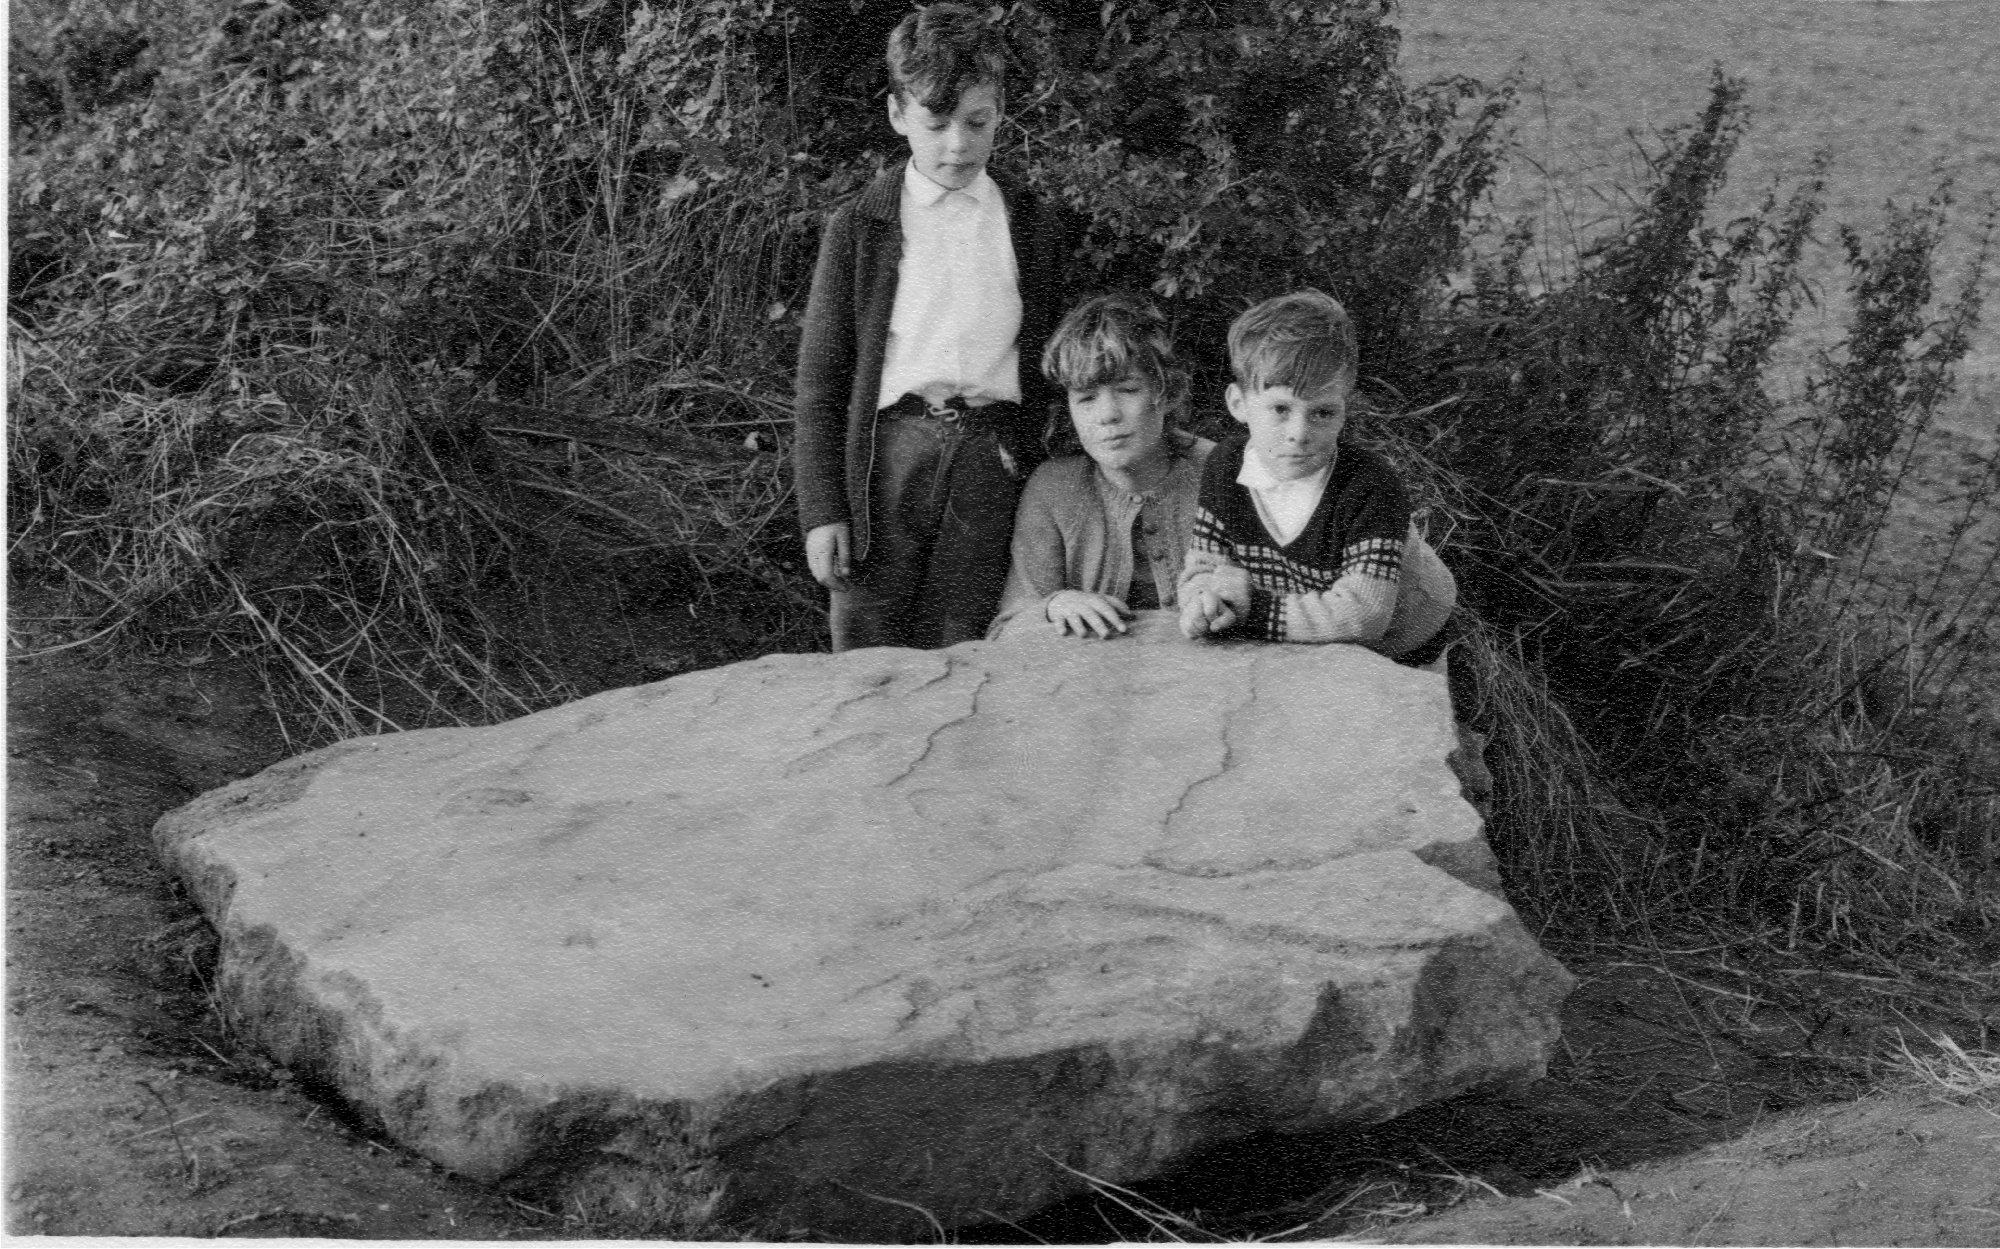 Broadstone_Gypsy children